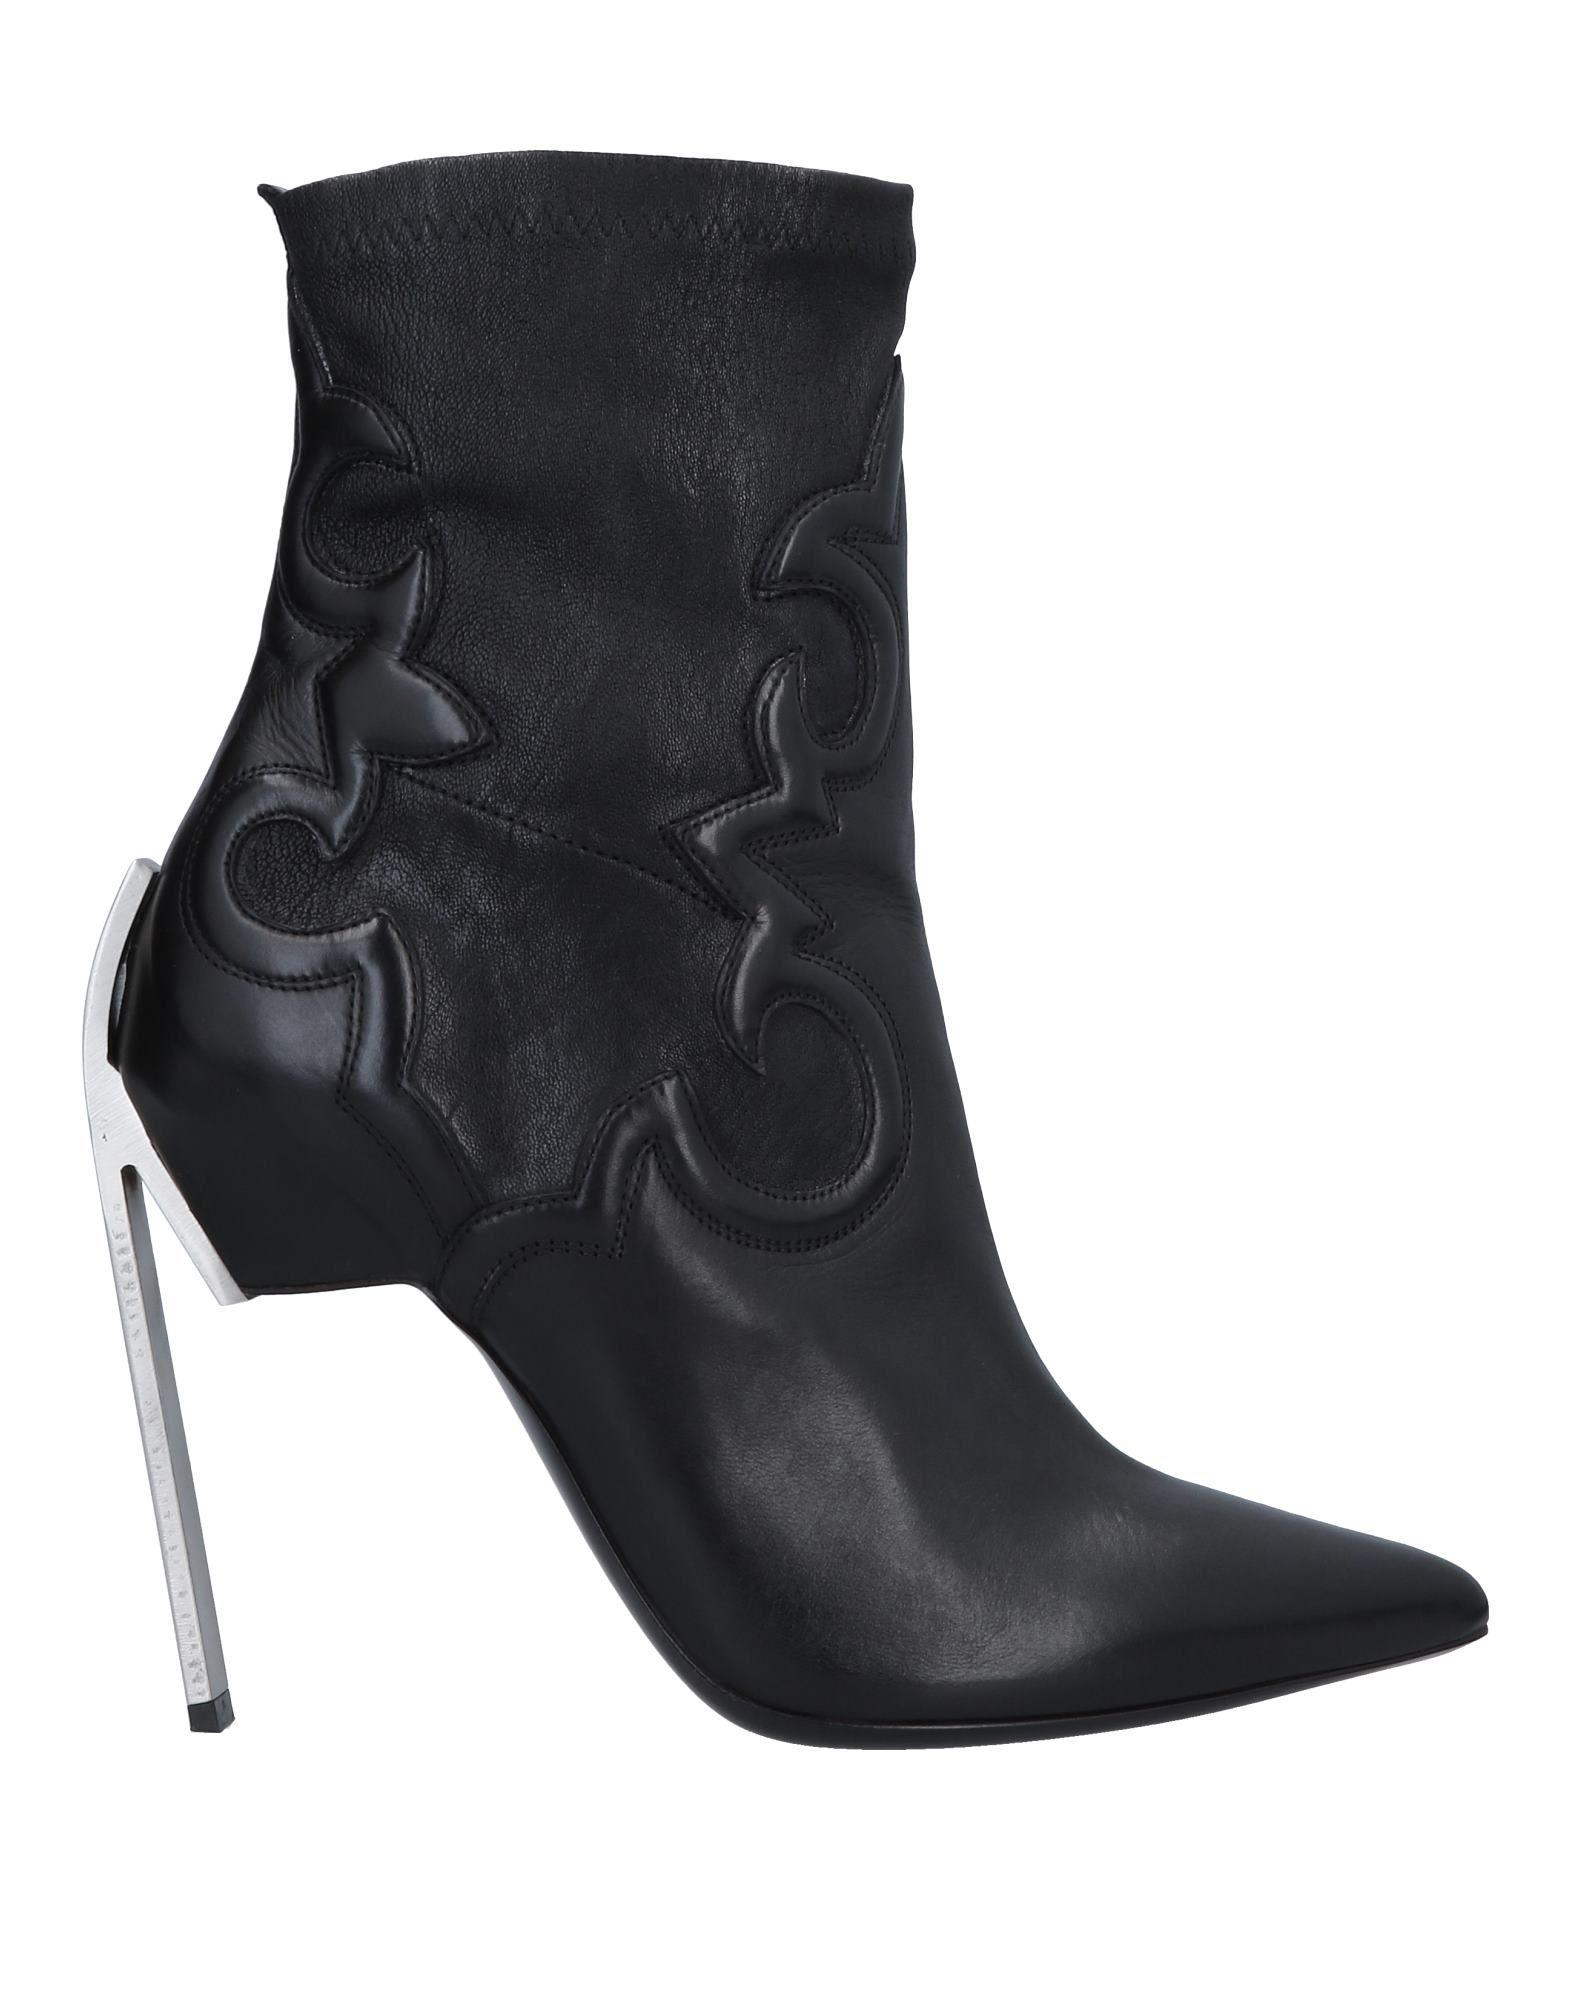 Rabatt Schuhe Matiē Vic Matiē Schuhe Stiefelette Damen 11557362CM 37ad33